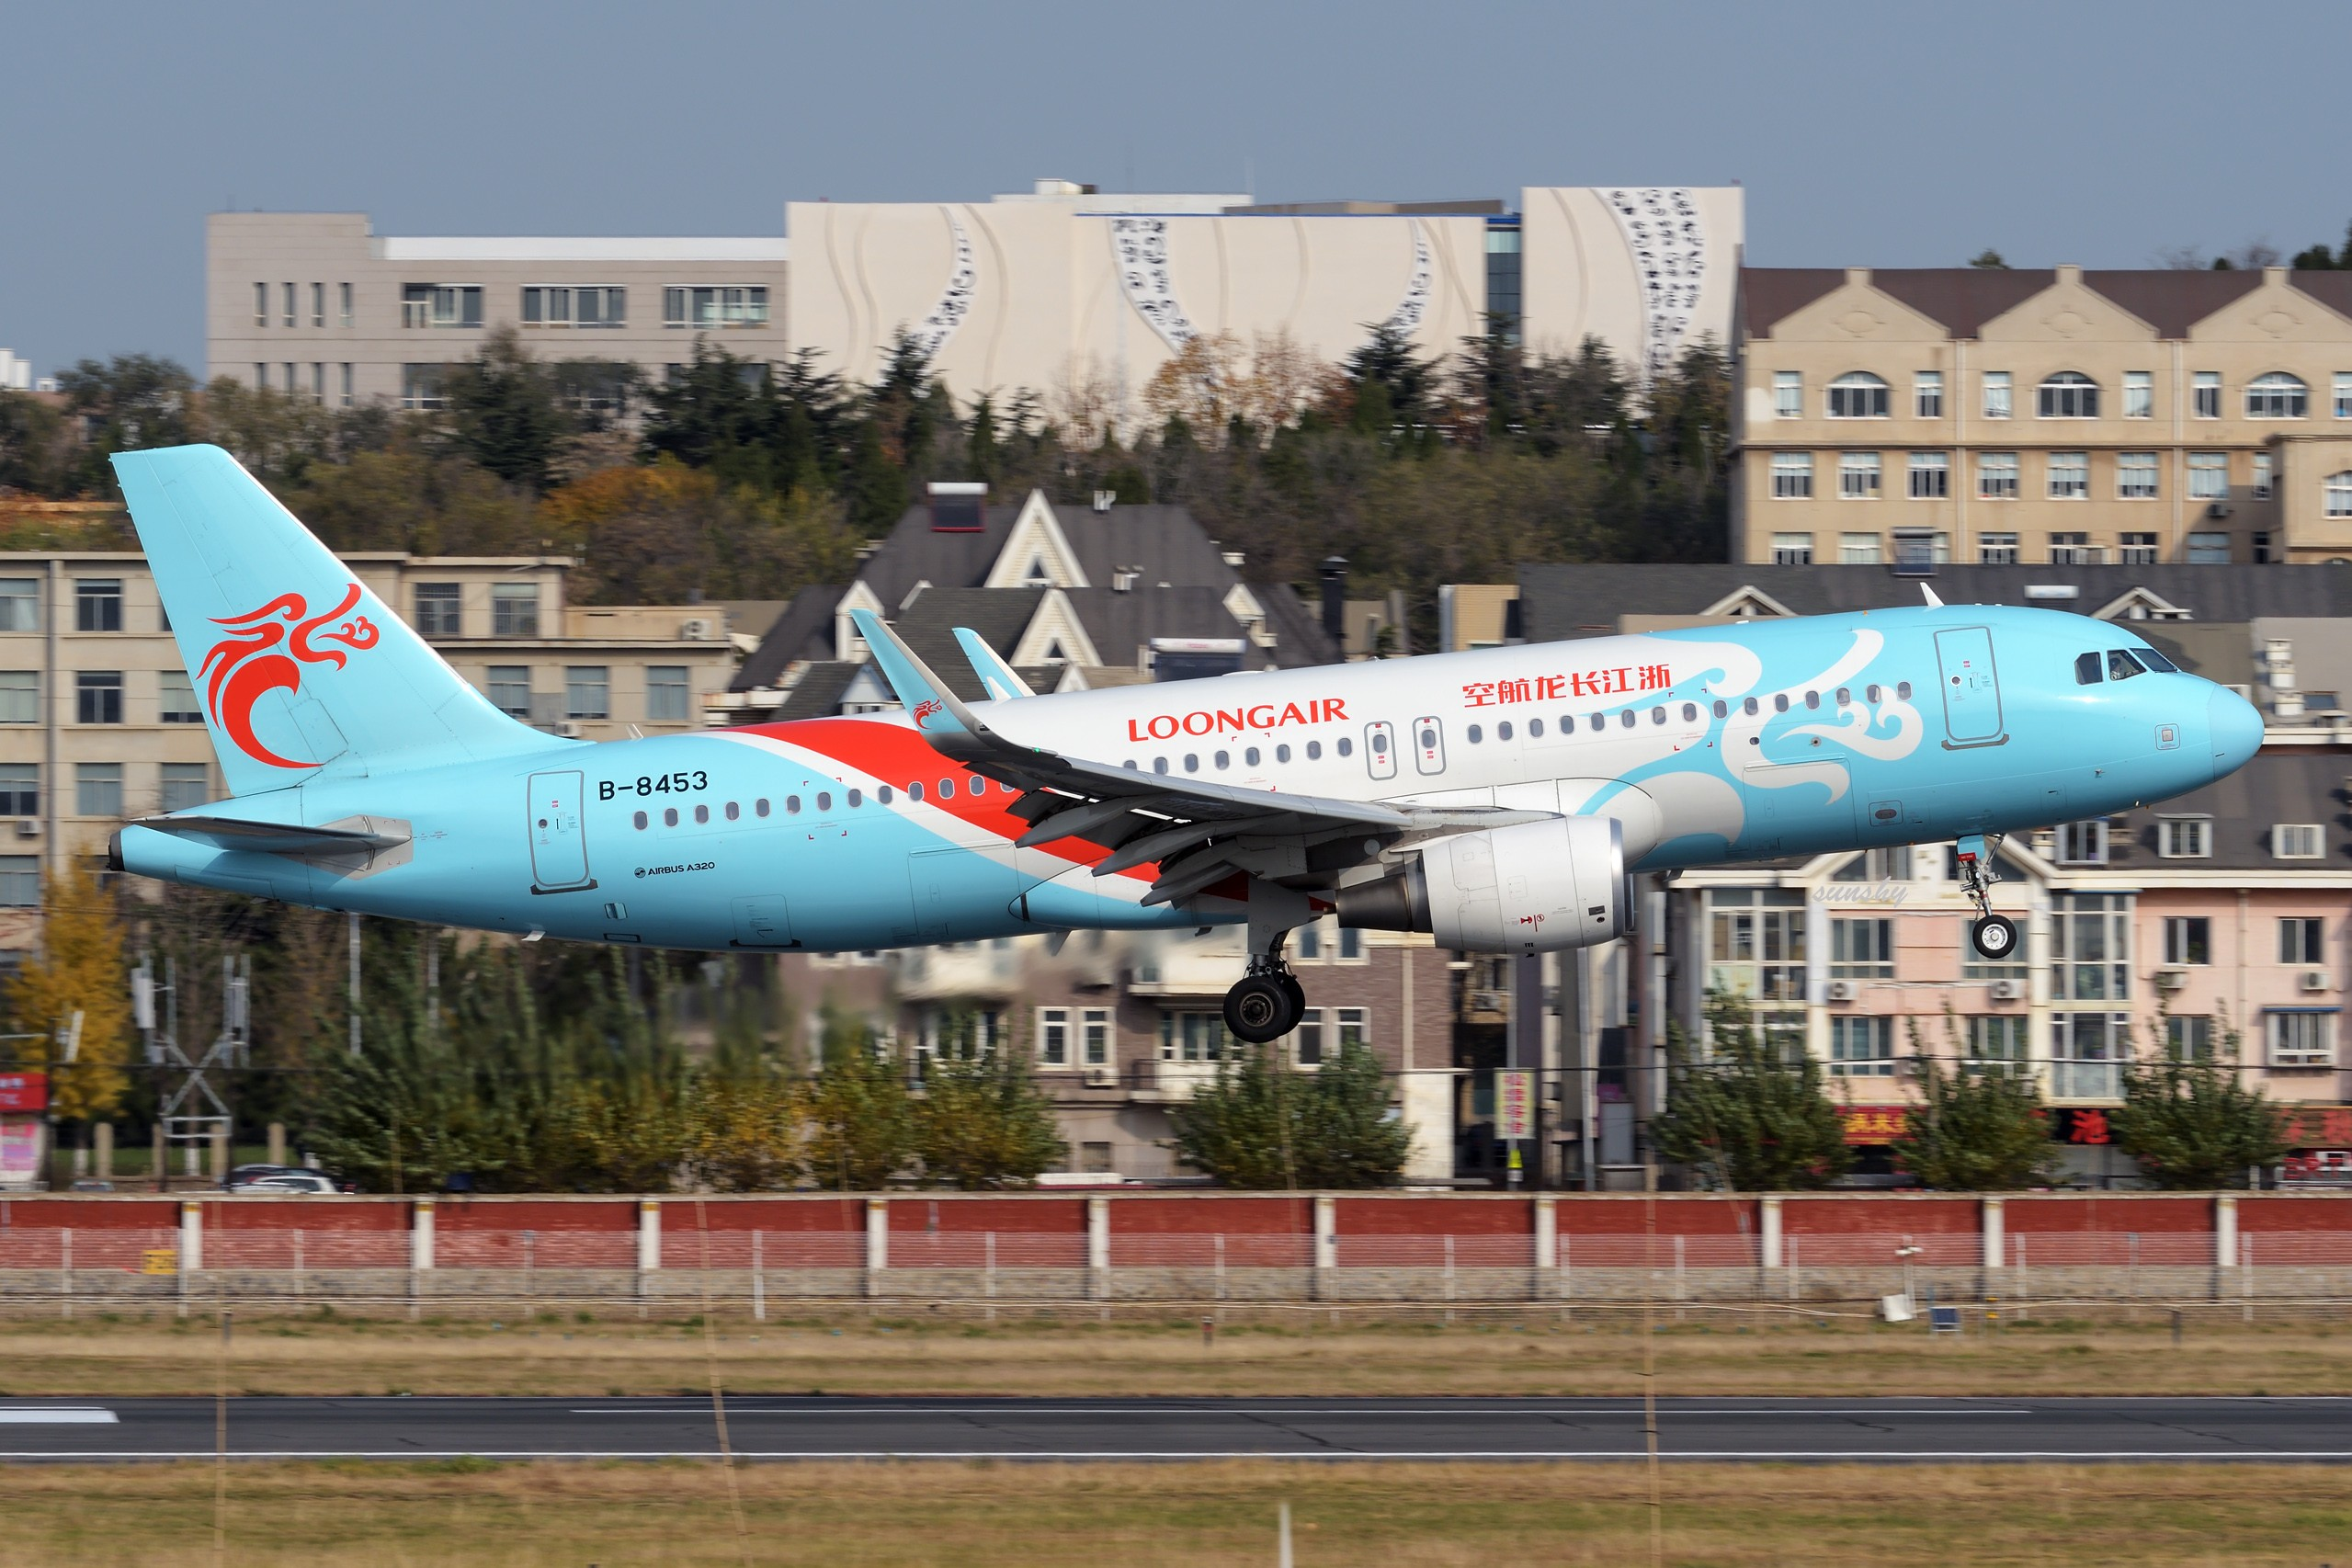 Re:[原创]★[DLC]一点有趣的事情(国庆加点儿料)★ AIRBUS A320-200 B-8453 中国大连国际机场